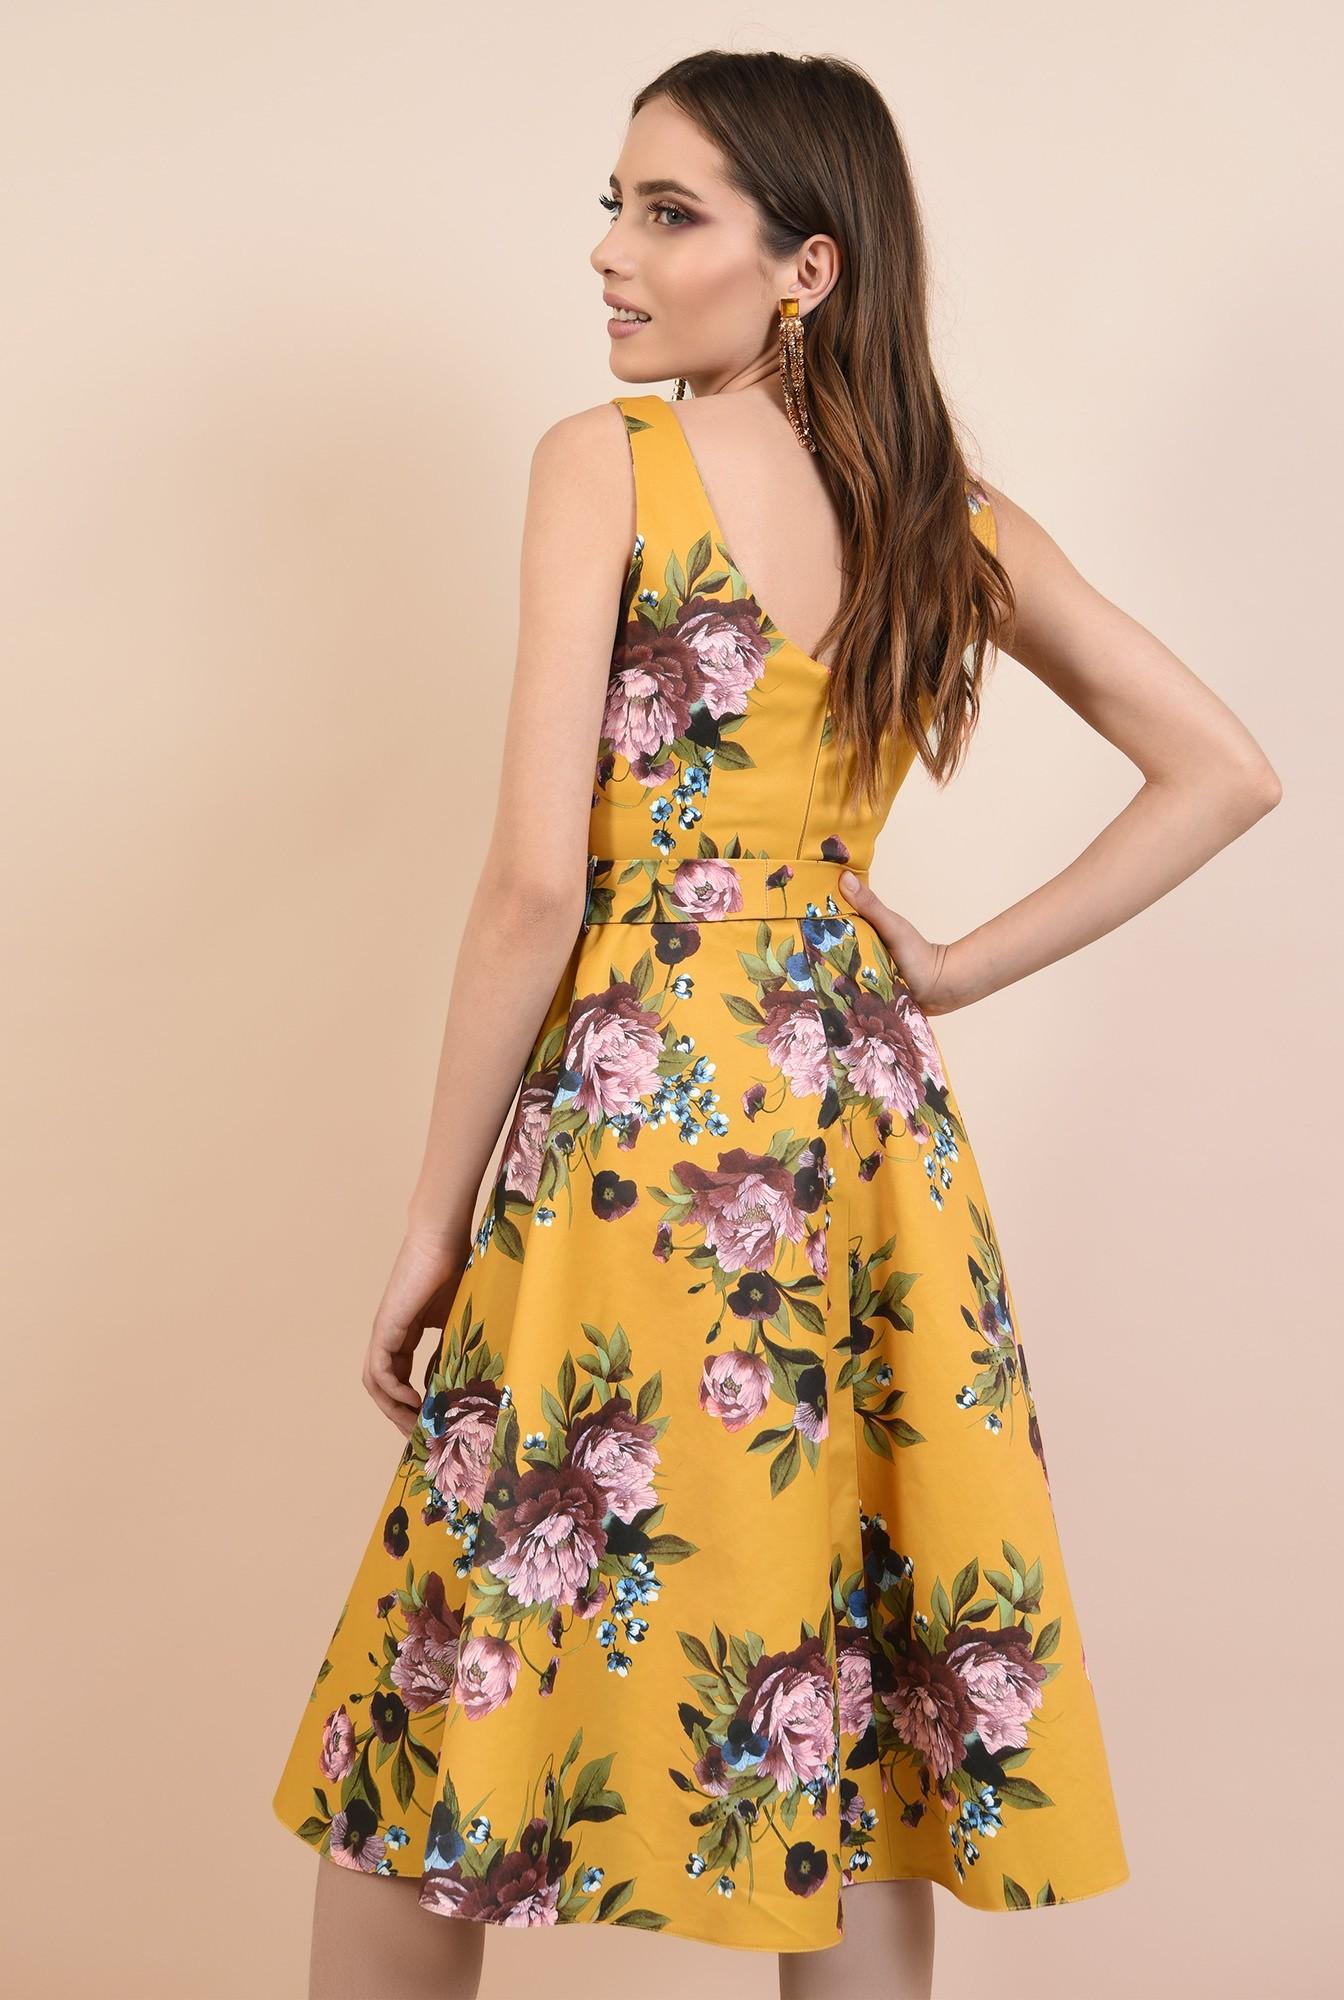 1 - rochie de seara, cu croi evazata, imprimeu floral, cordon cu funda la talie